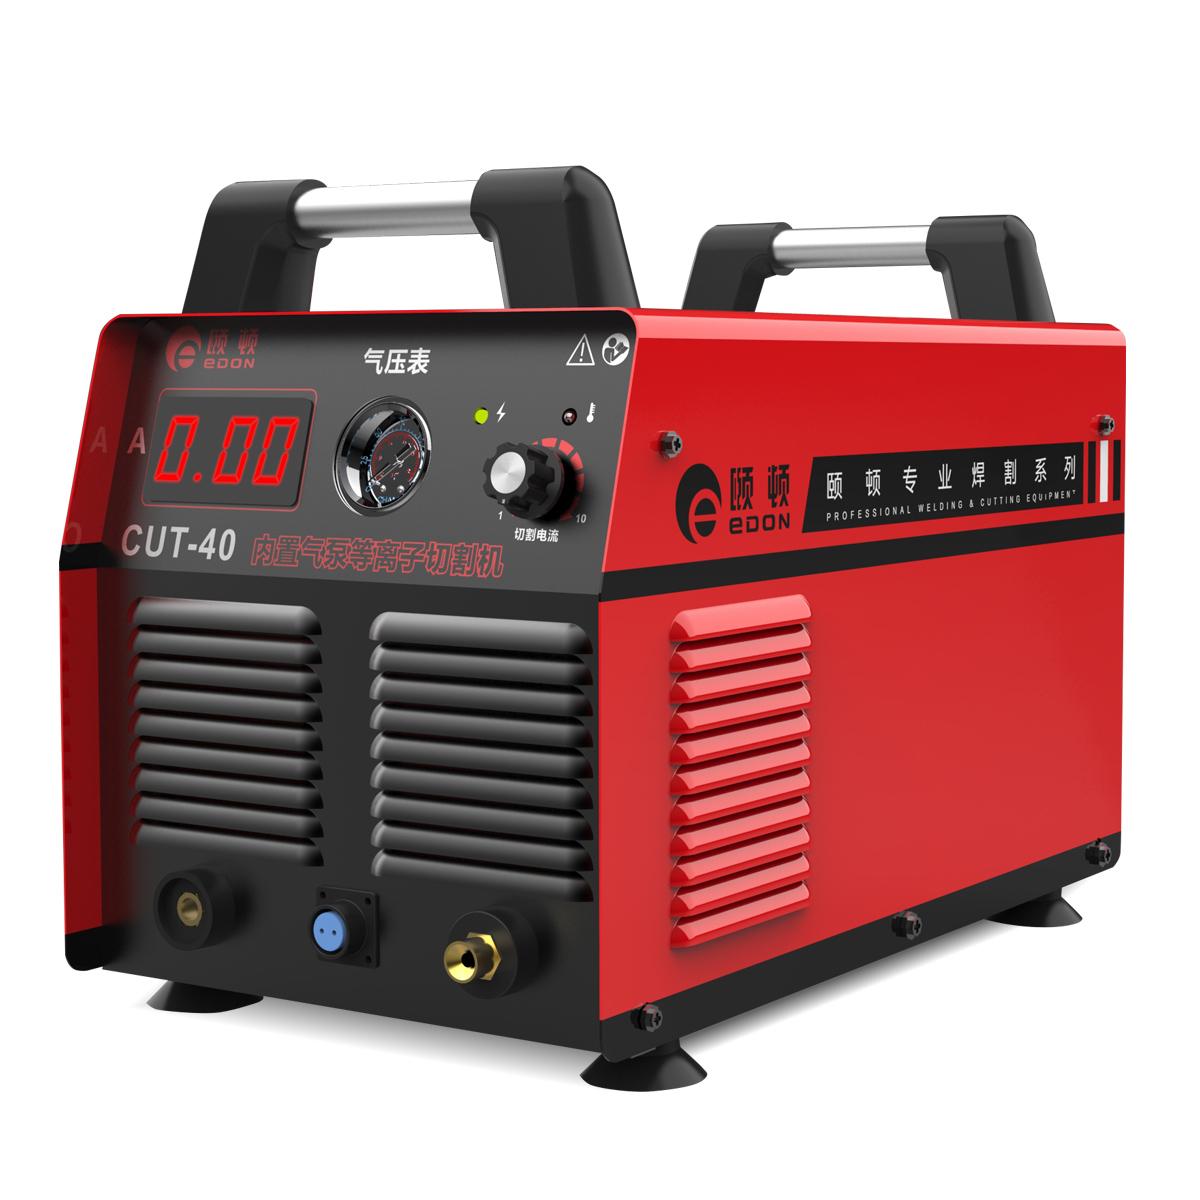 CUT-40(内置气泵)